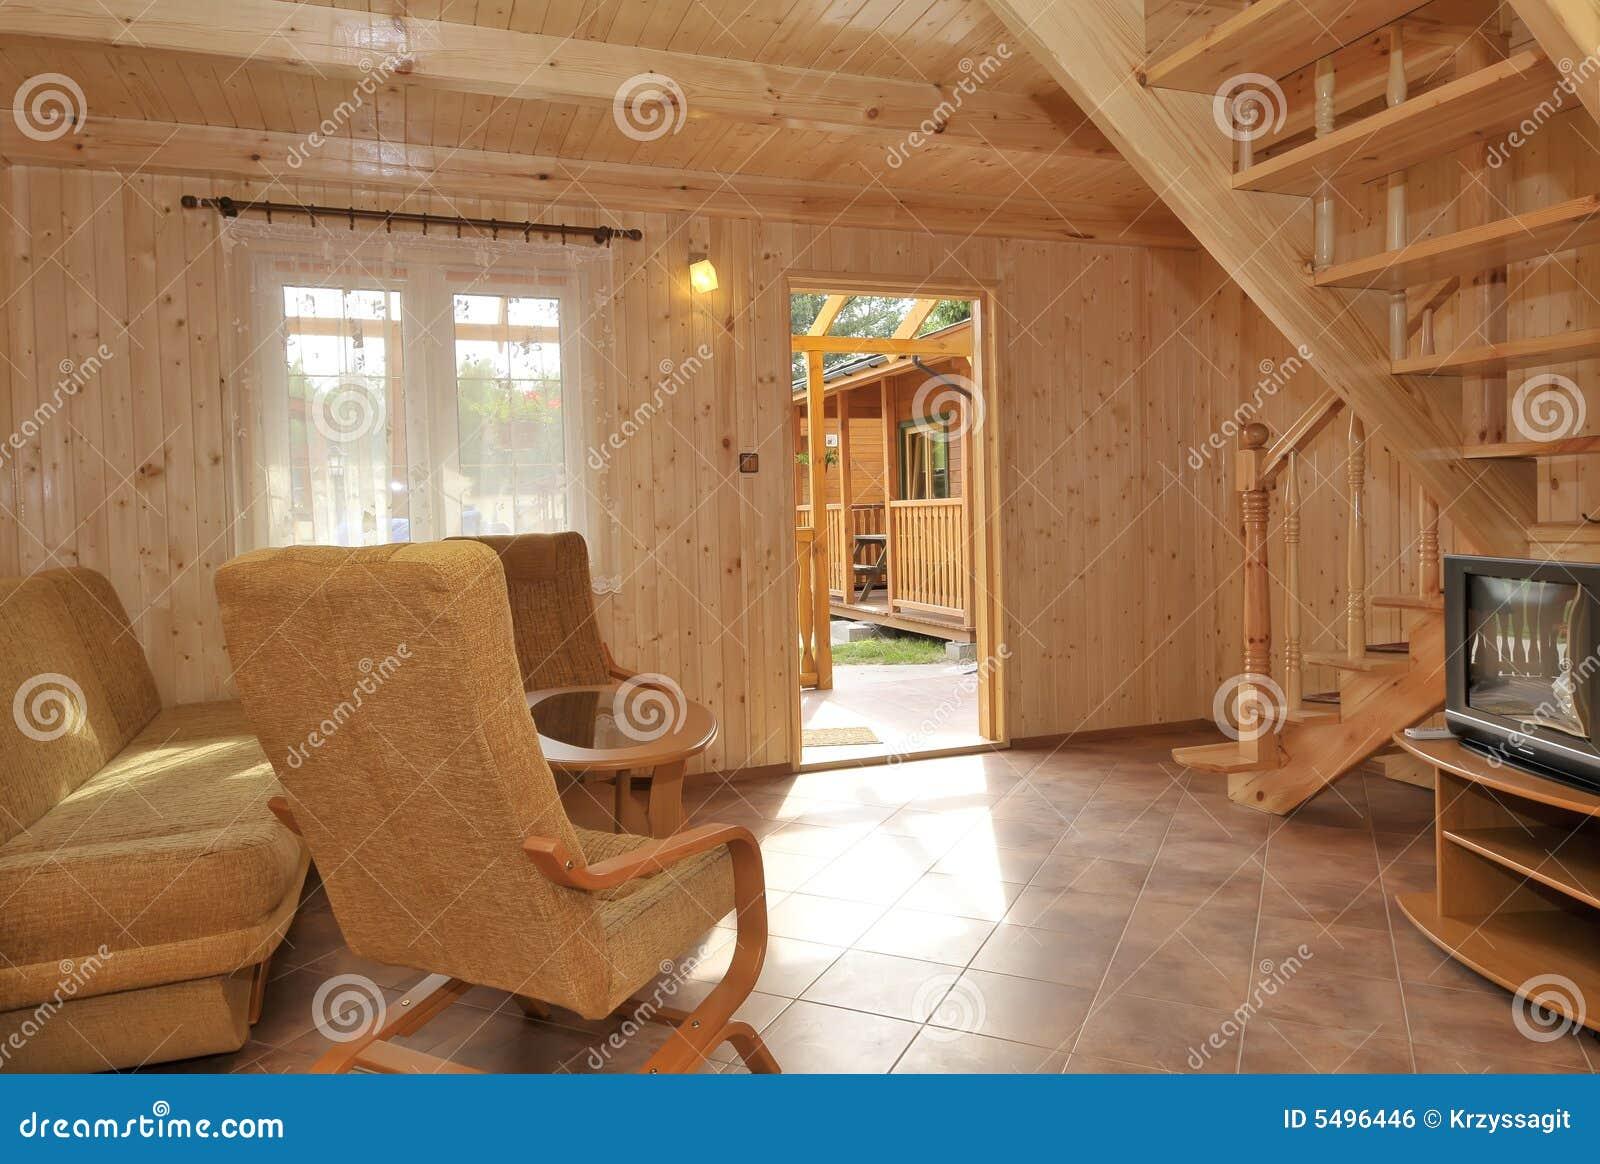 Interior of wood paneled house